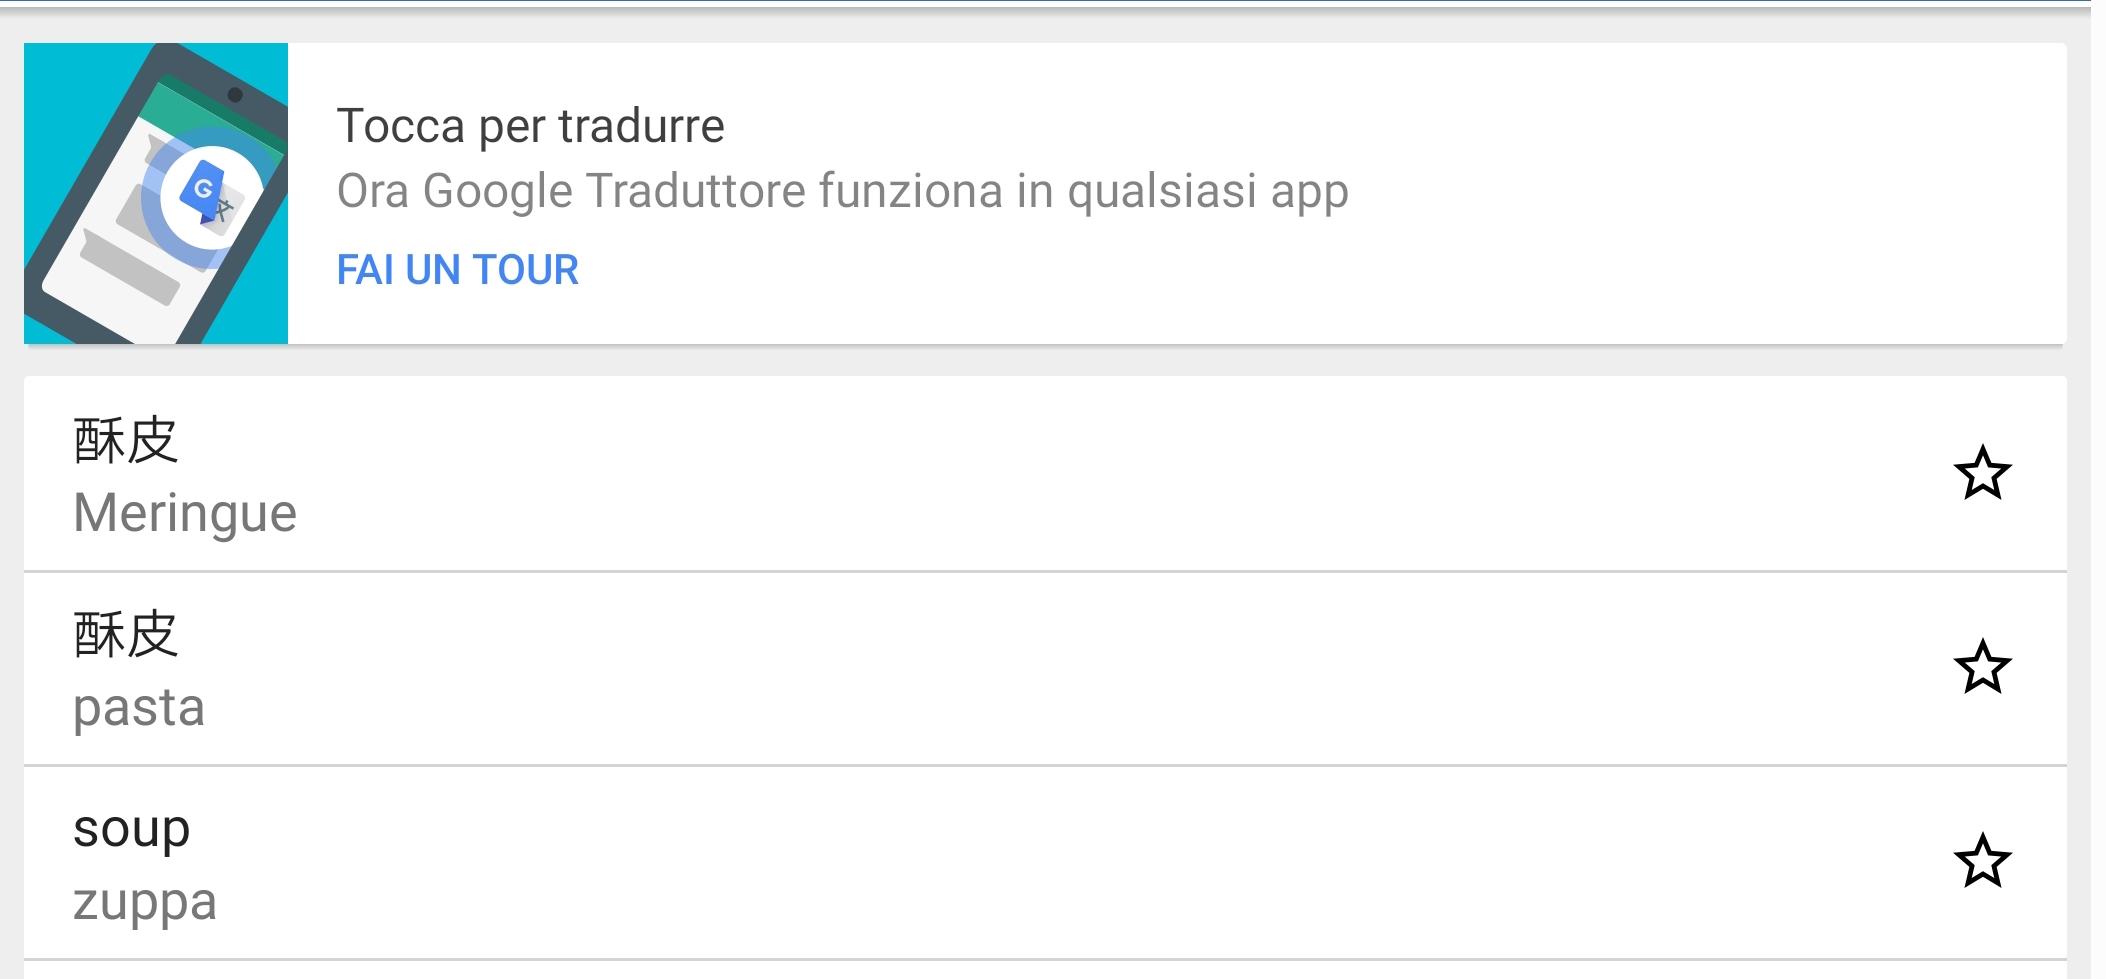 Google Traduttore frasi preferite